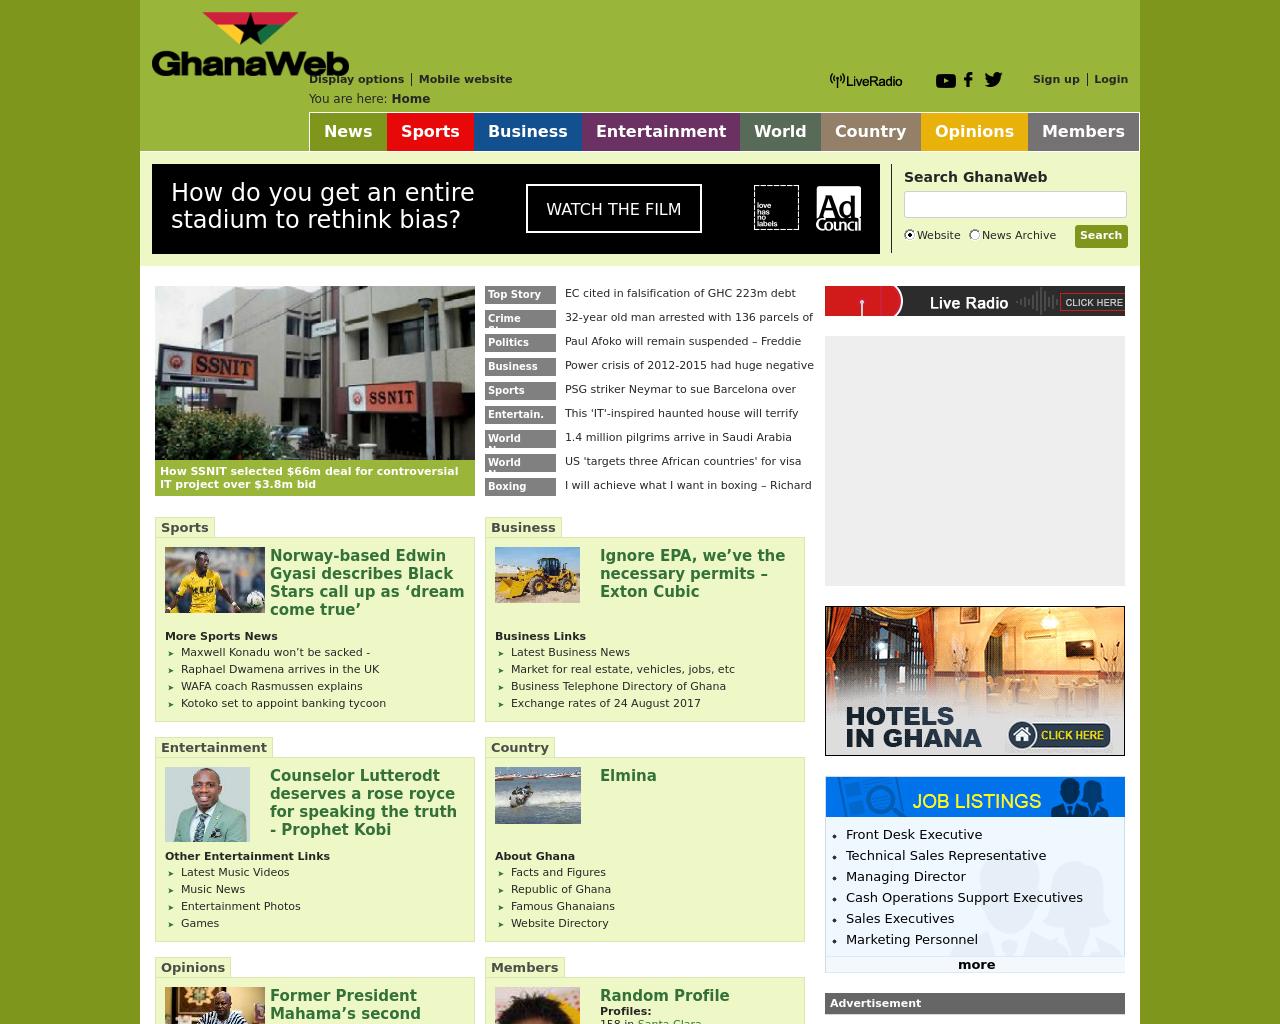 Ghanaweb-Advertising-Reviews-Pricing